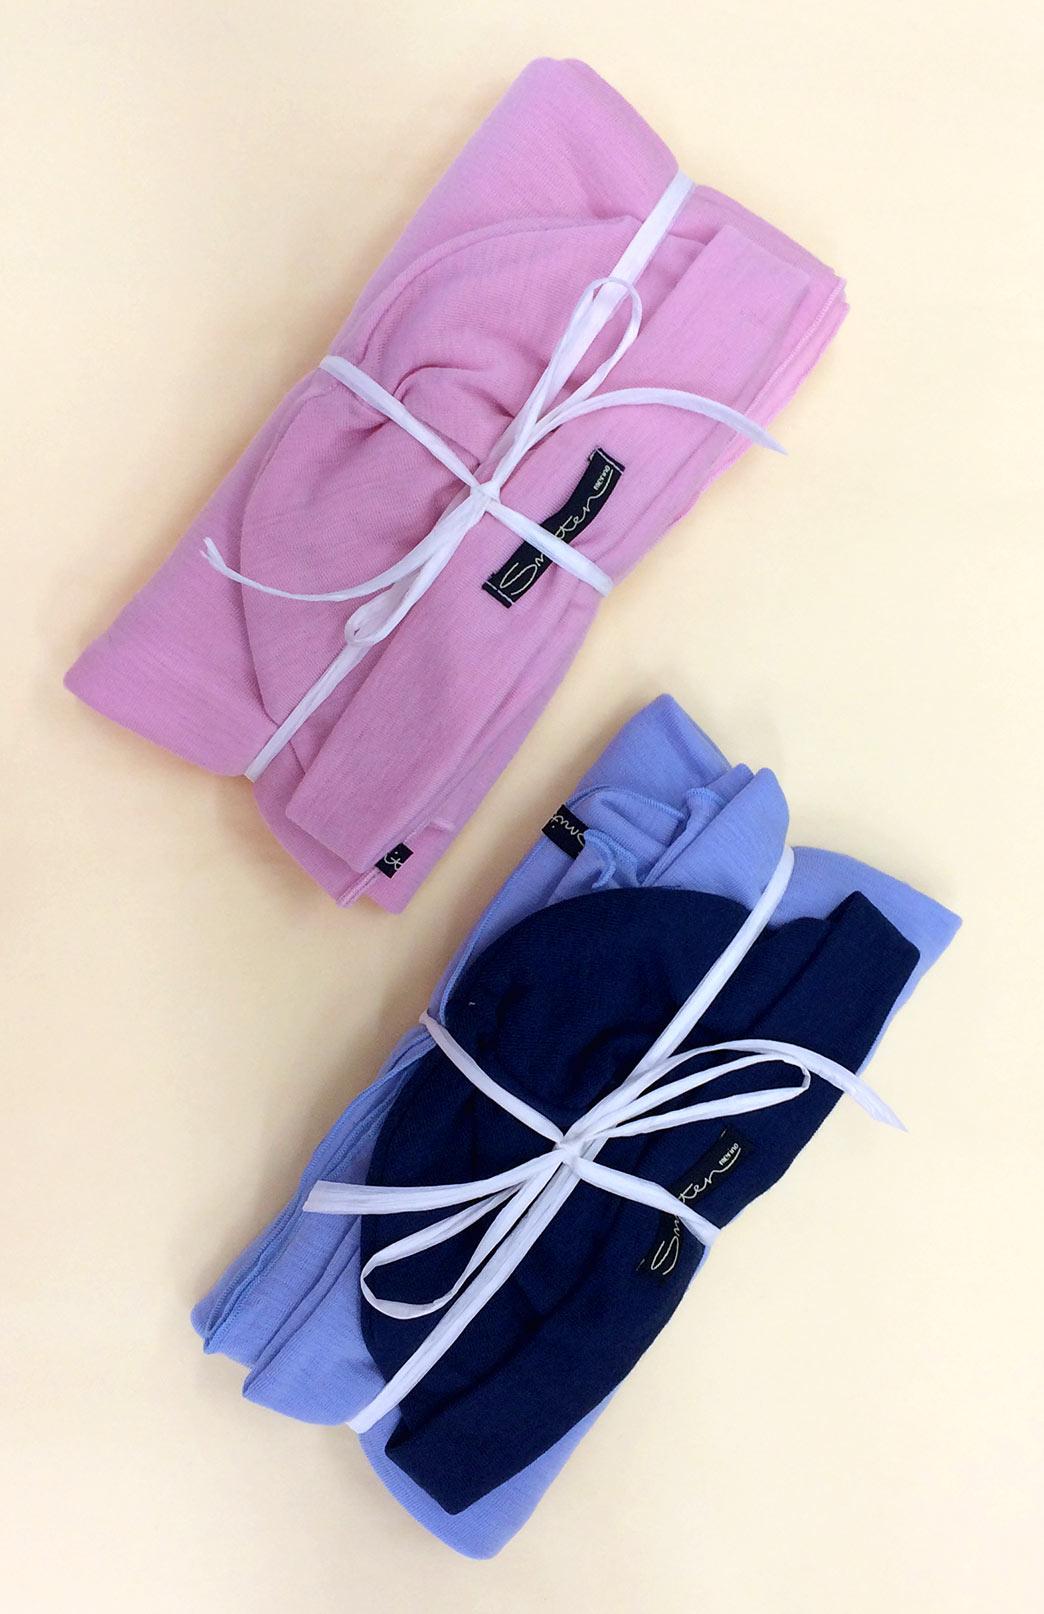 Baby Wrap and Beanie Set - Merino Wool Baby Wrap Blanket and Beanie Gift Set (Soft Pink Wrap and Matching Beanie) - Smitten Merino Tasmania Australia